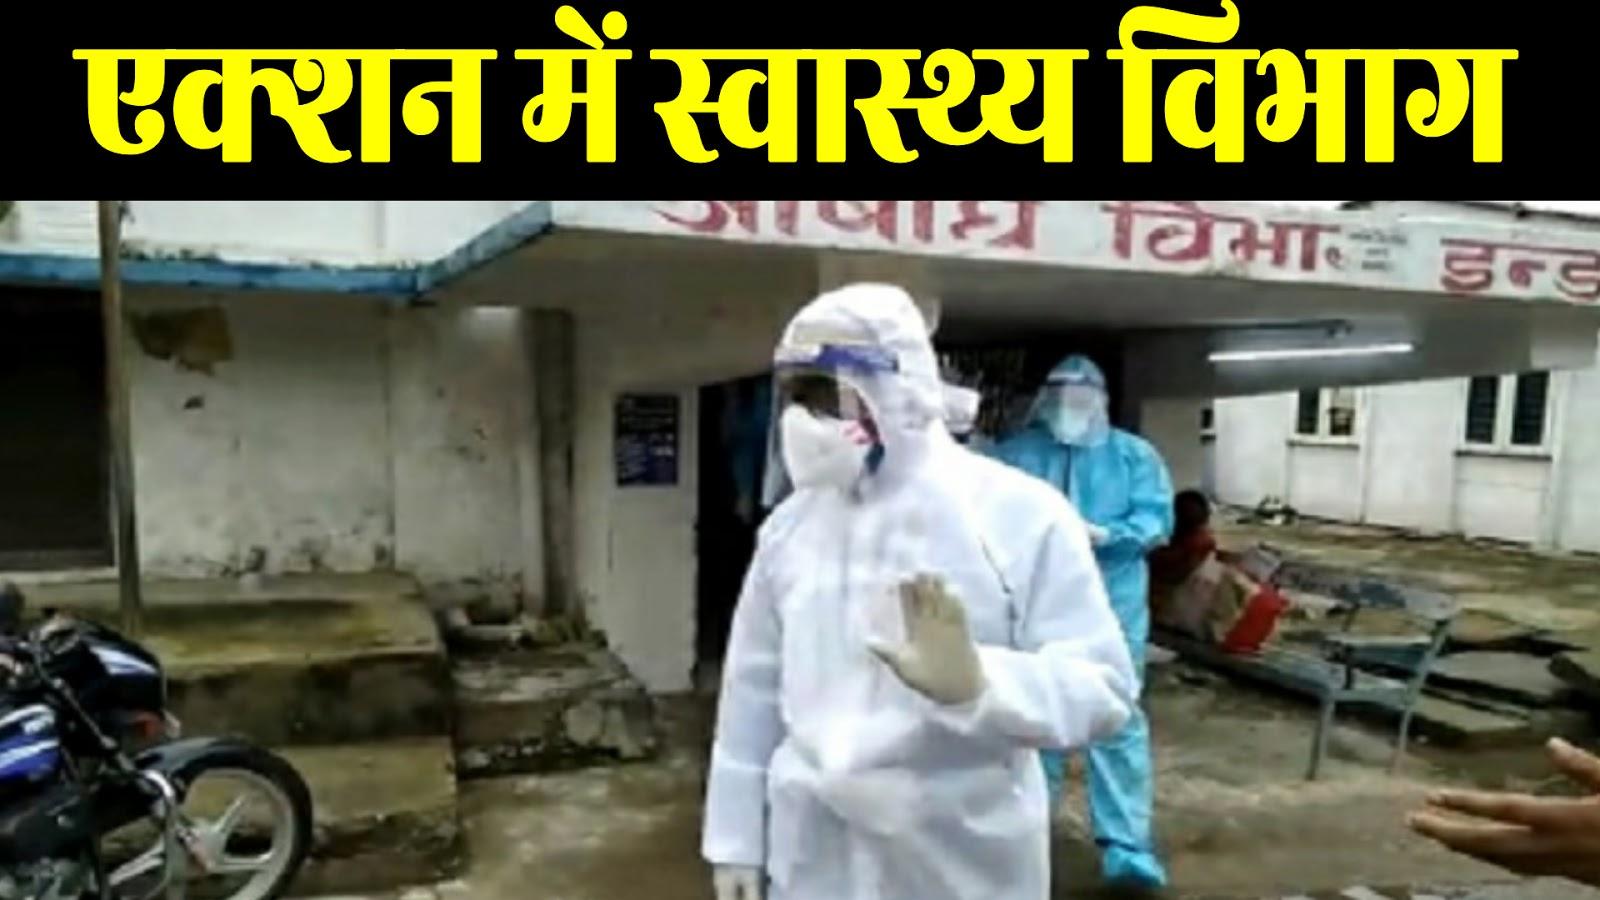 स्वास्थ्य विभाग की जिम्मेदारी संभालते ही एक्शन, प्रत्यय अमृत, ने अस्पताल का किया निरीक्षण